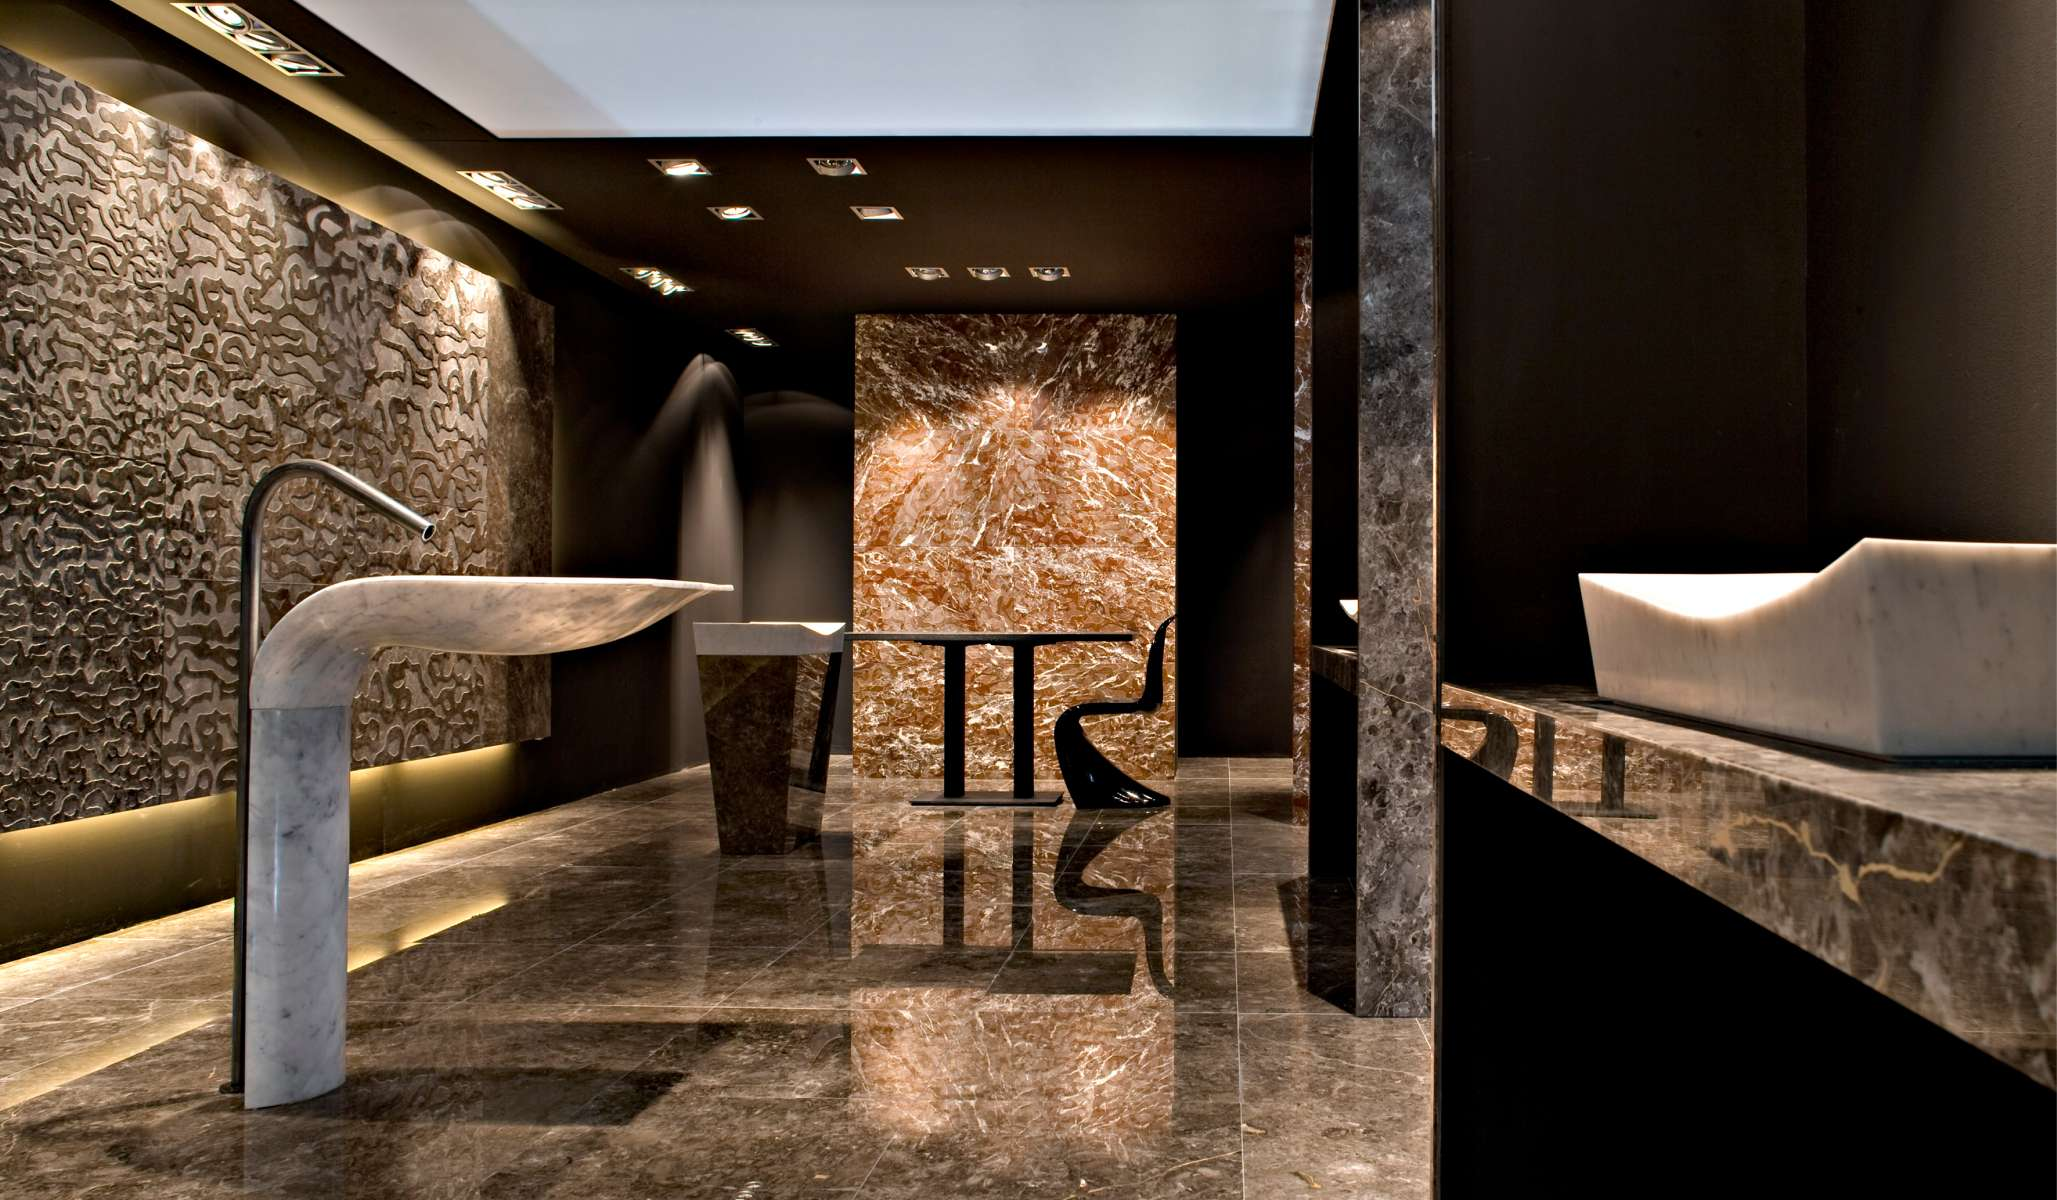 Studio Marco Piva – Product design – 313